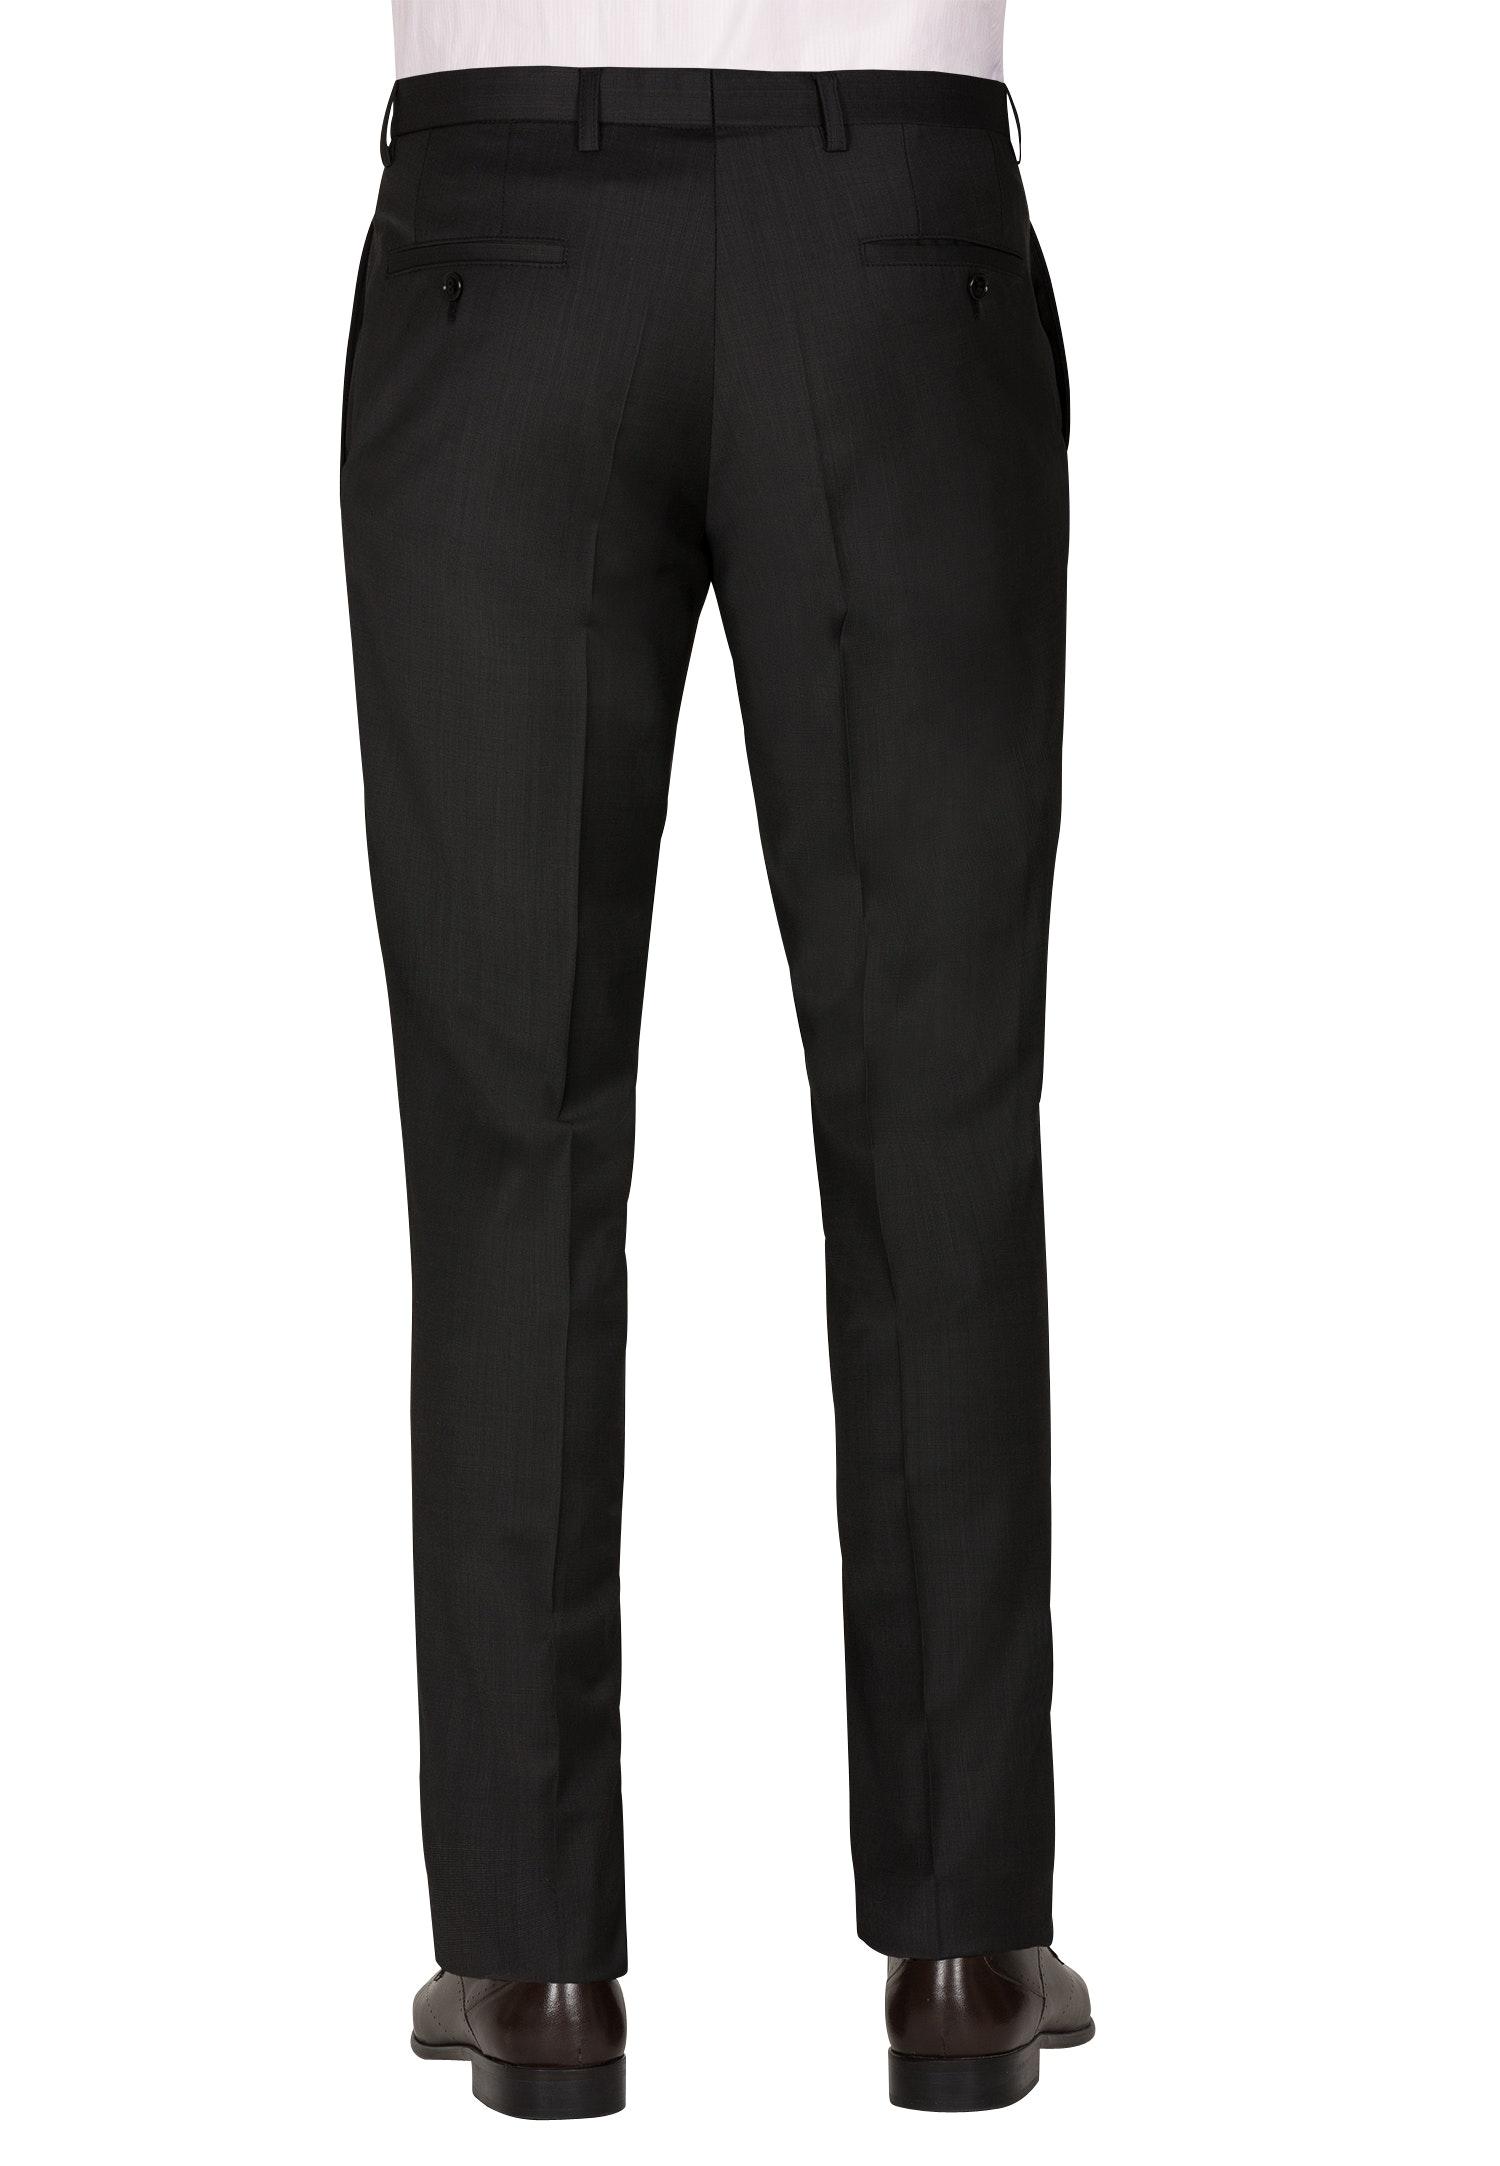 Hose/trousers Archiebald